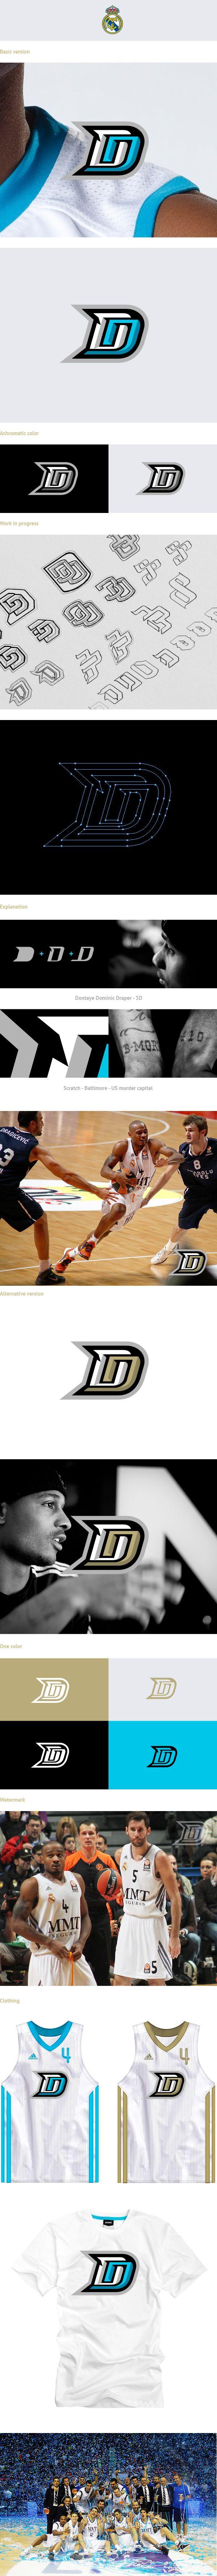 Dontaye Draper - Real Madrid by Kamil Doliwa, via Behance